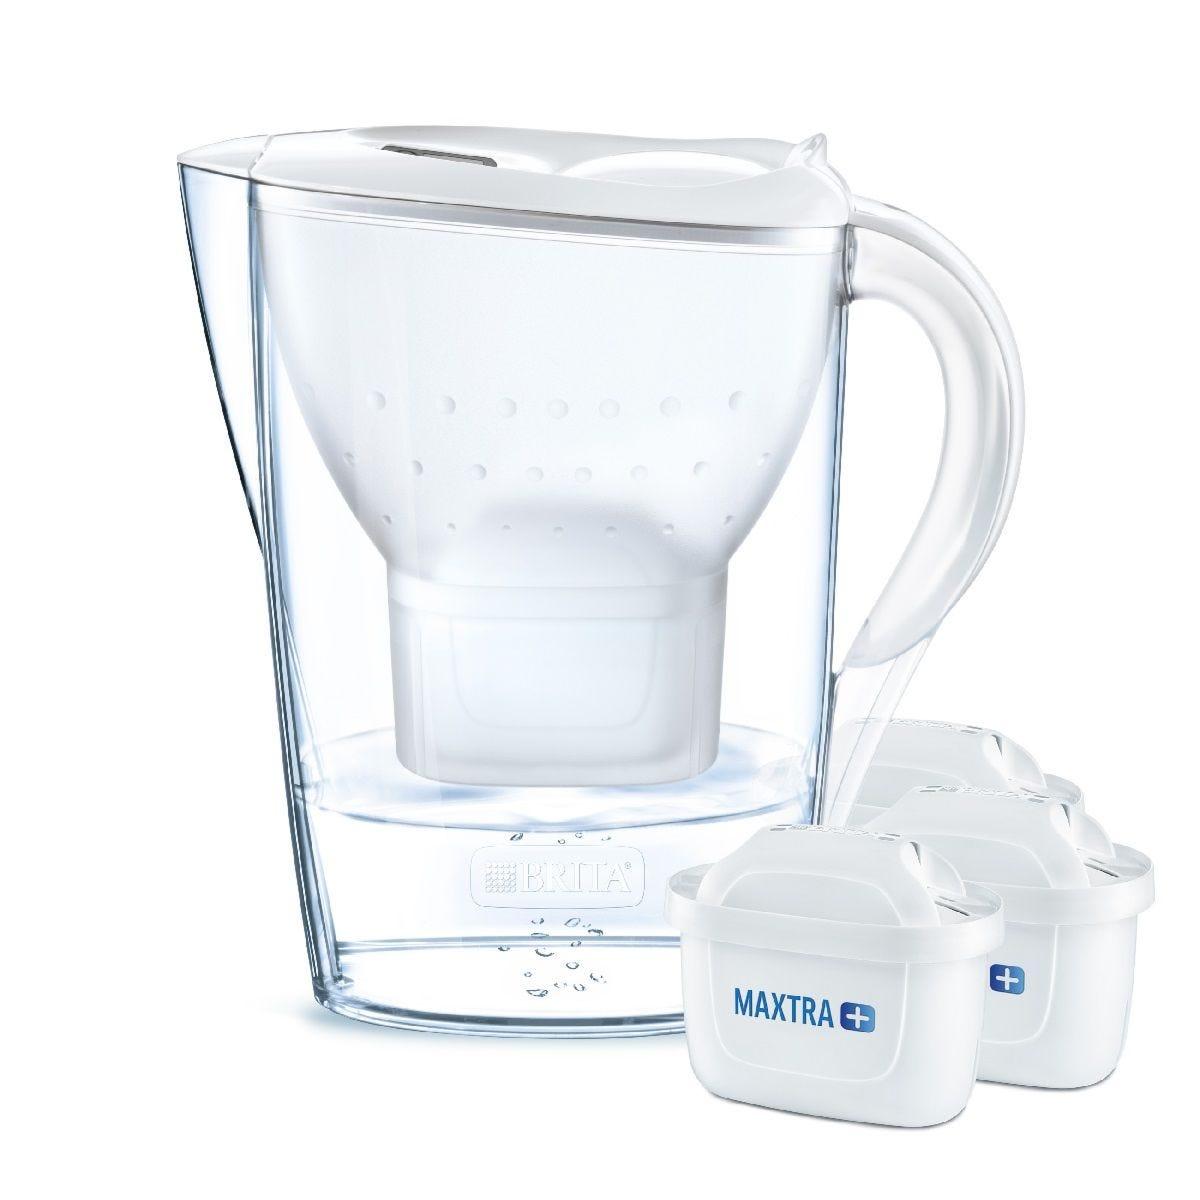 Brita Maxtra+ Marella Water Filter 2.4L Jug 3 Month Starter Pack - White